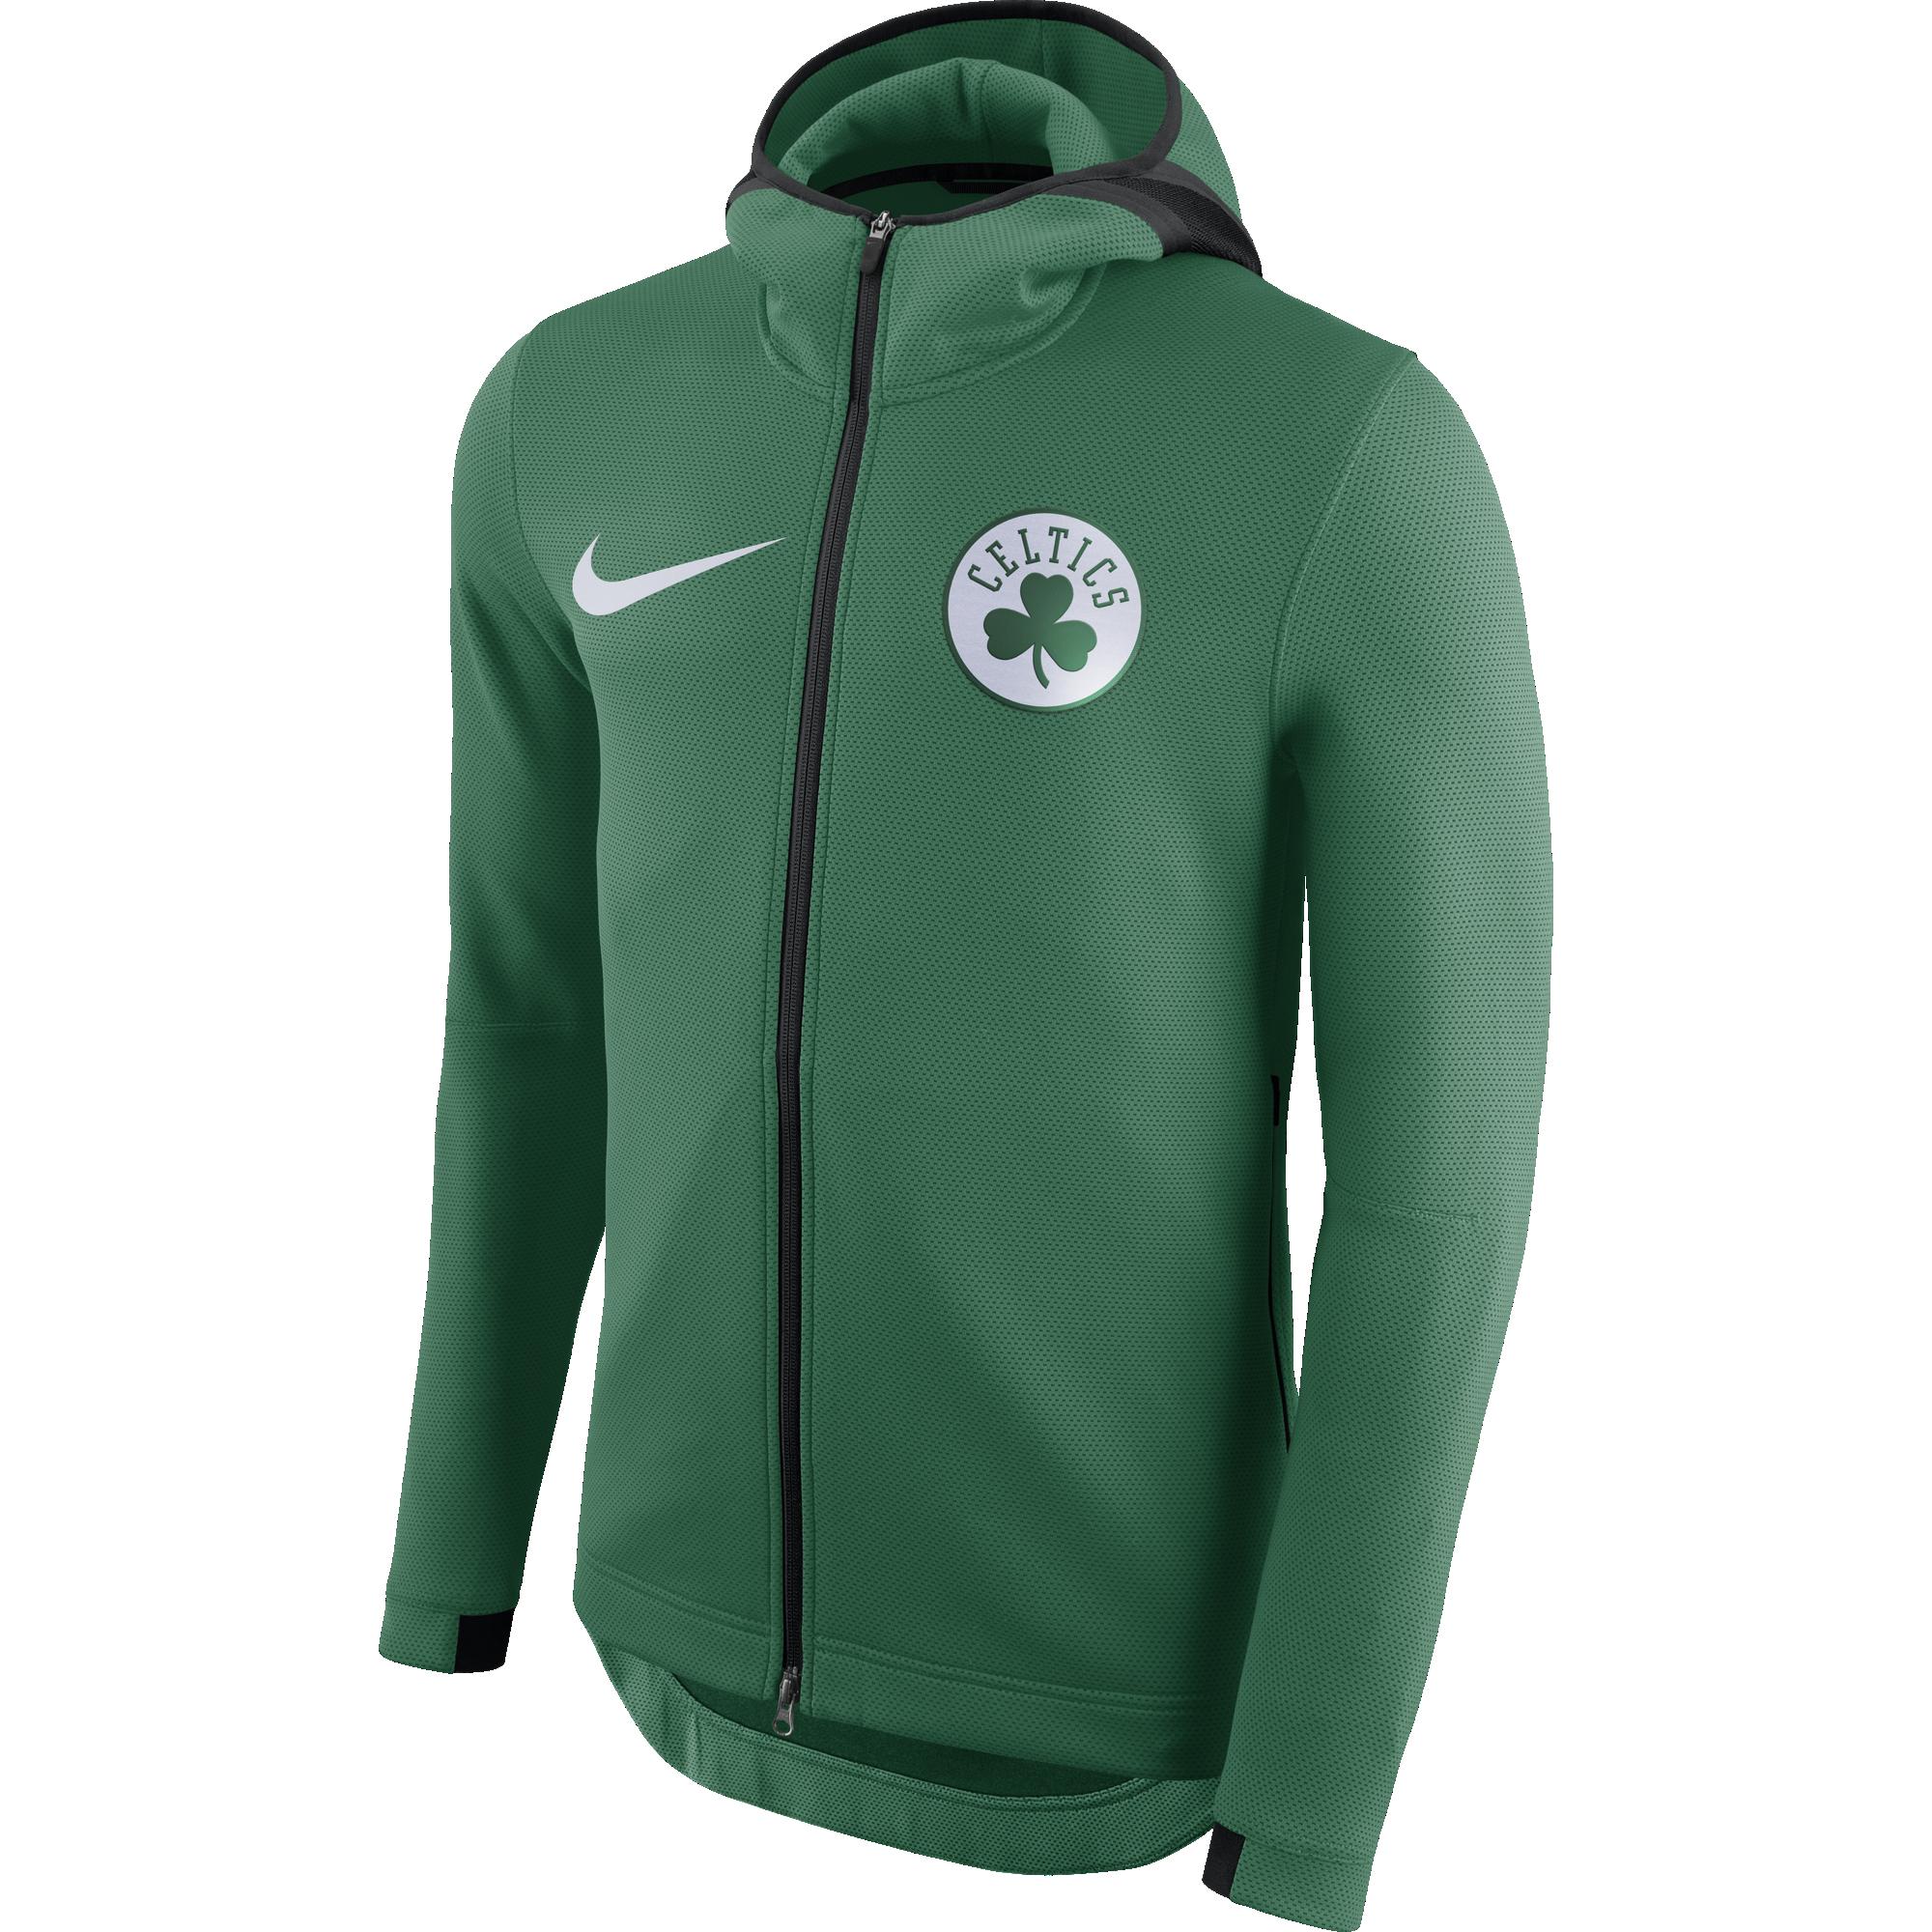 Nike NBA Boston Celtics Showtime Hoodie | Hoodies | Hoodies